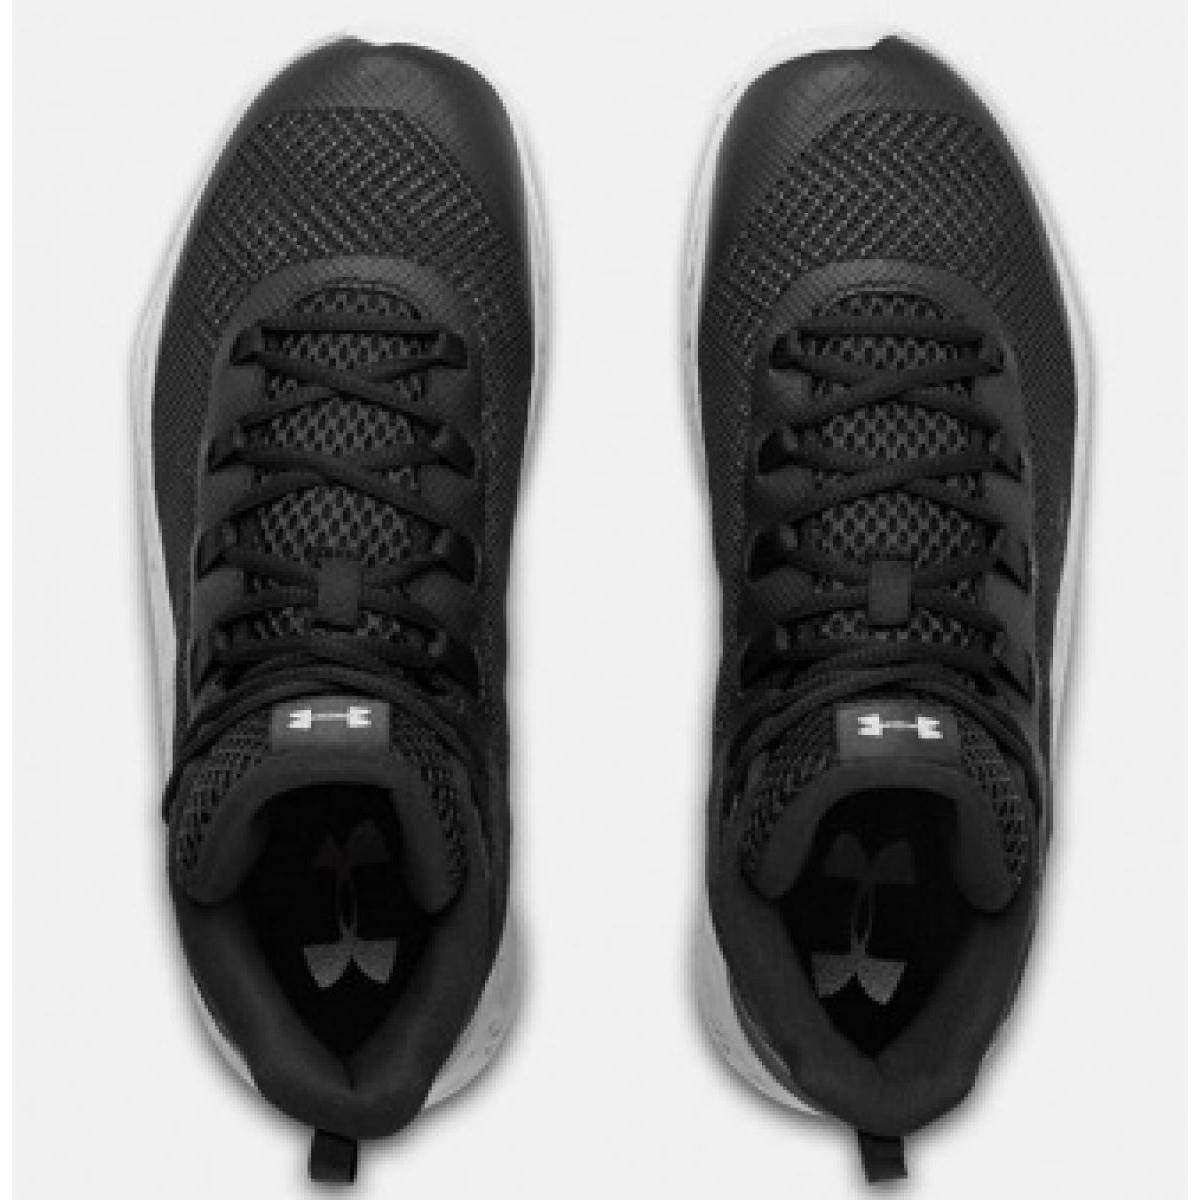 Under Armour Basketball shoes Ua Jet